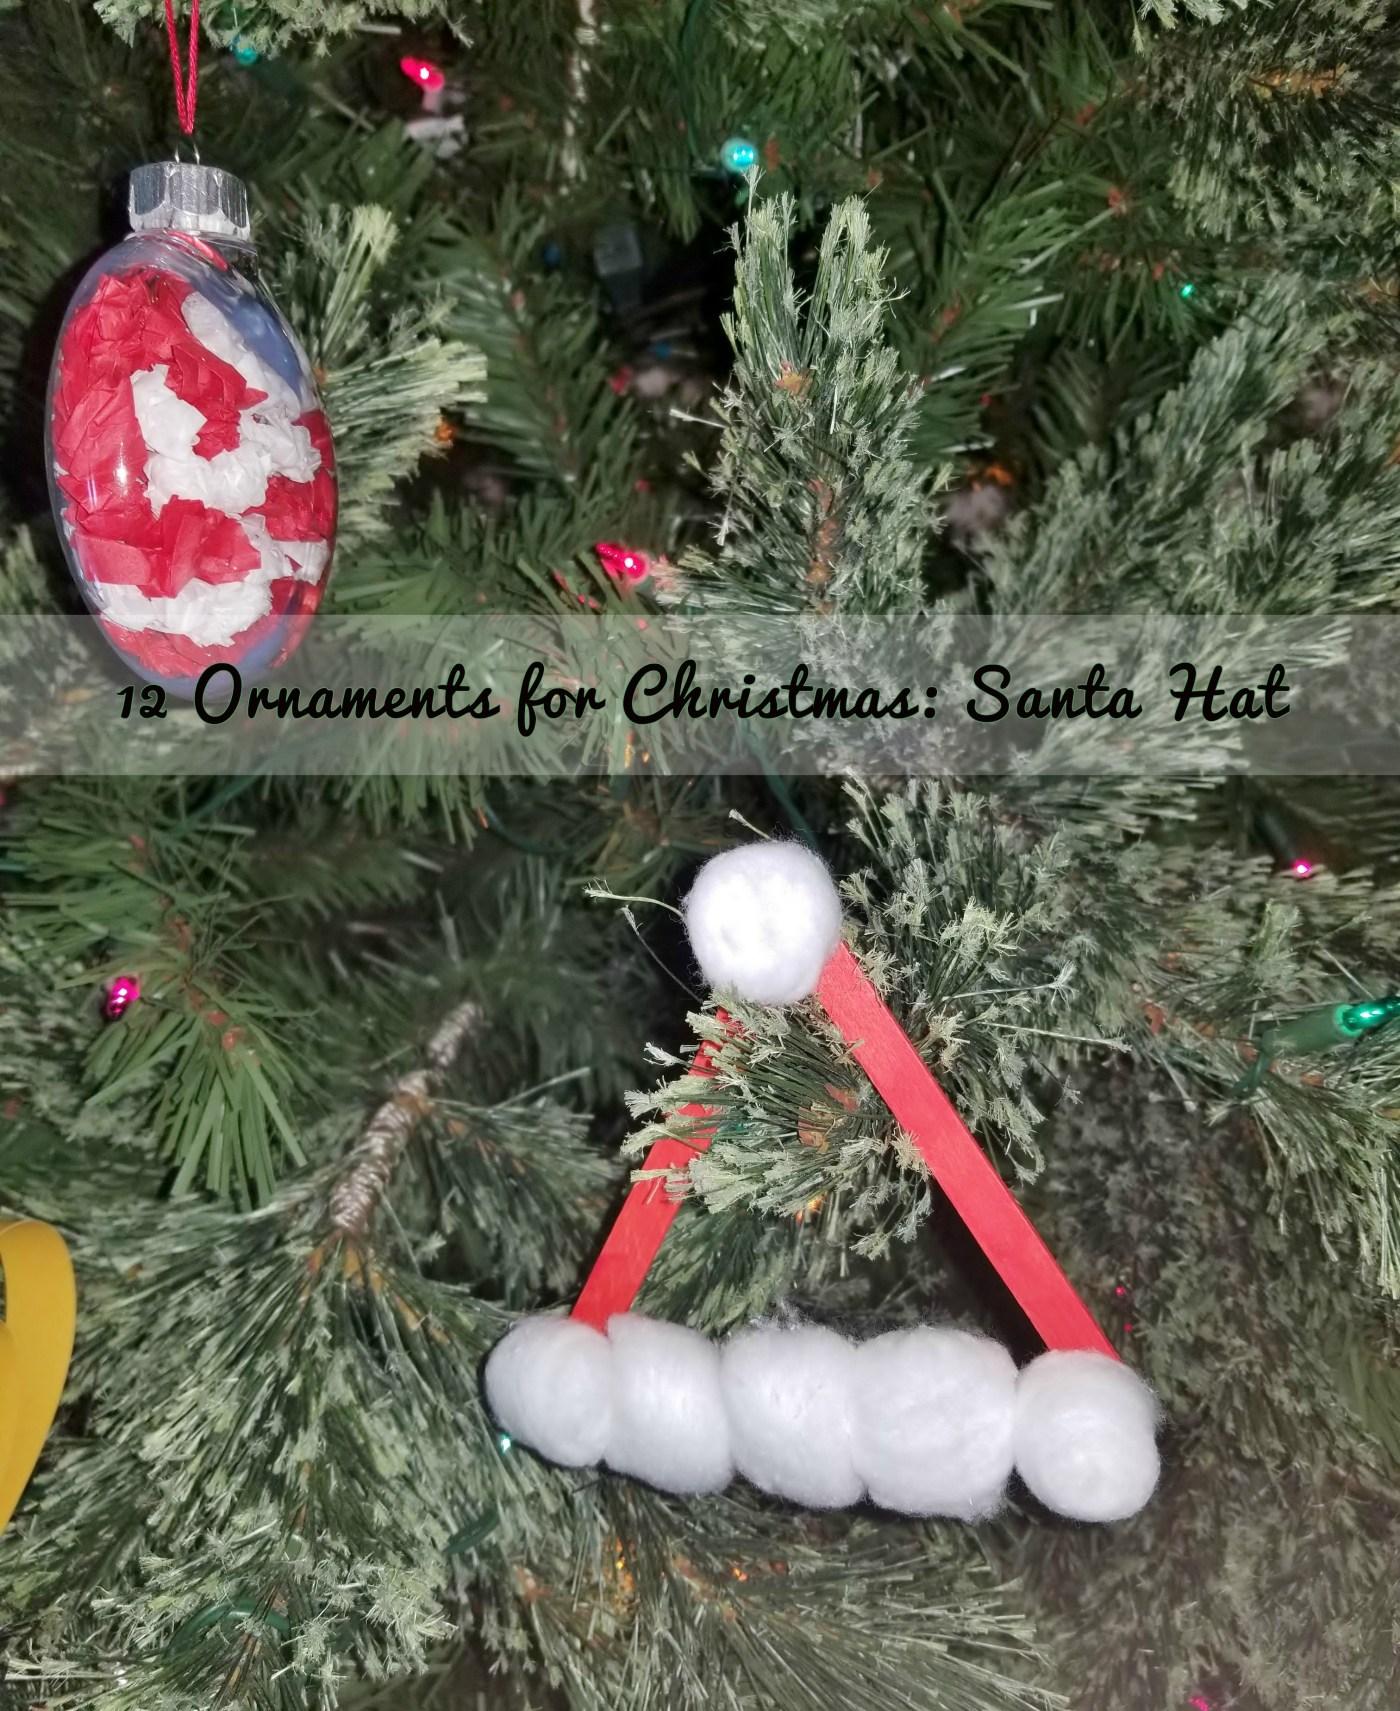 12 Ornaments for Christmas: Santa Hat